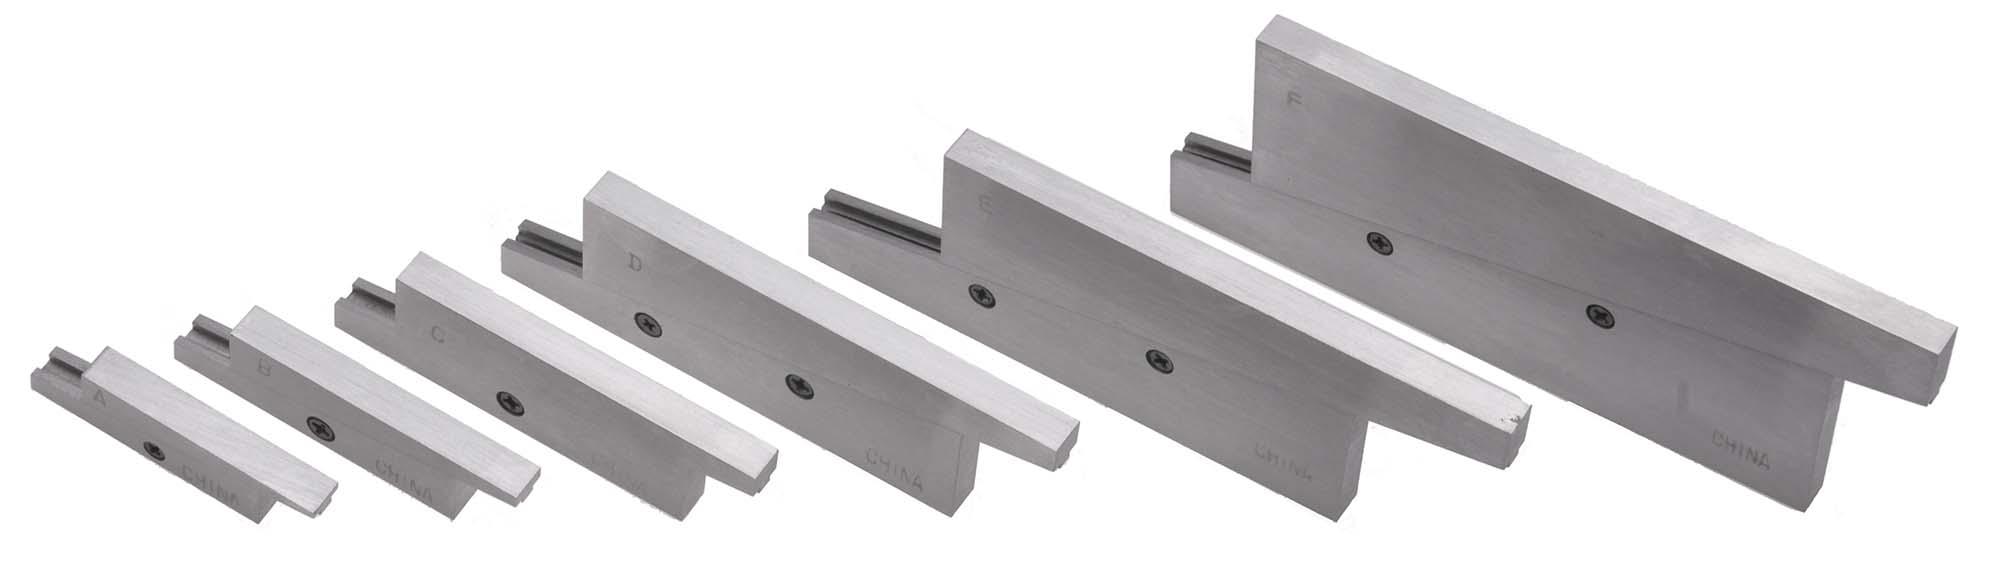 "PPA-66C  3/8 - 2-1/4"" - 6 Piece Adjustable Parallel Set"